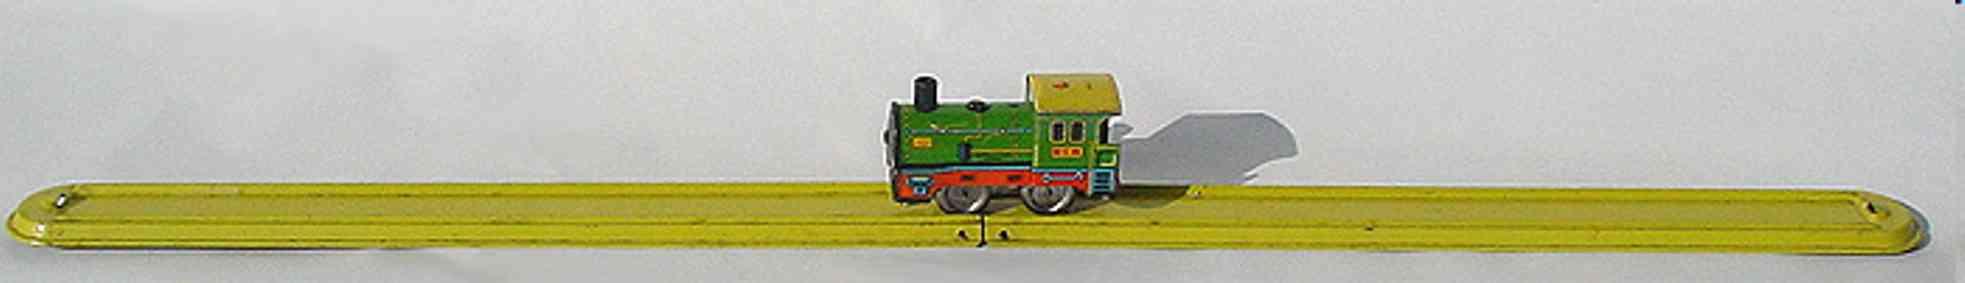 Technofix 288 Rangierlokomotive